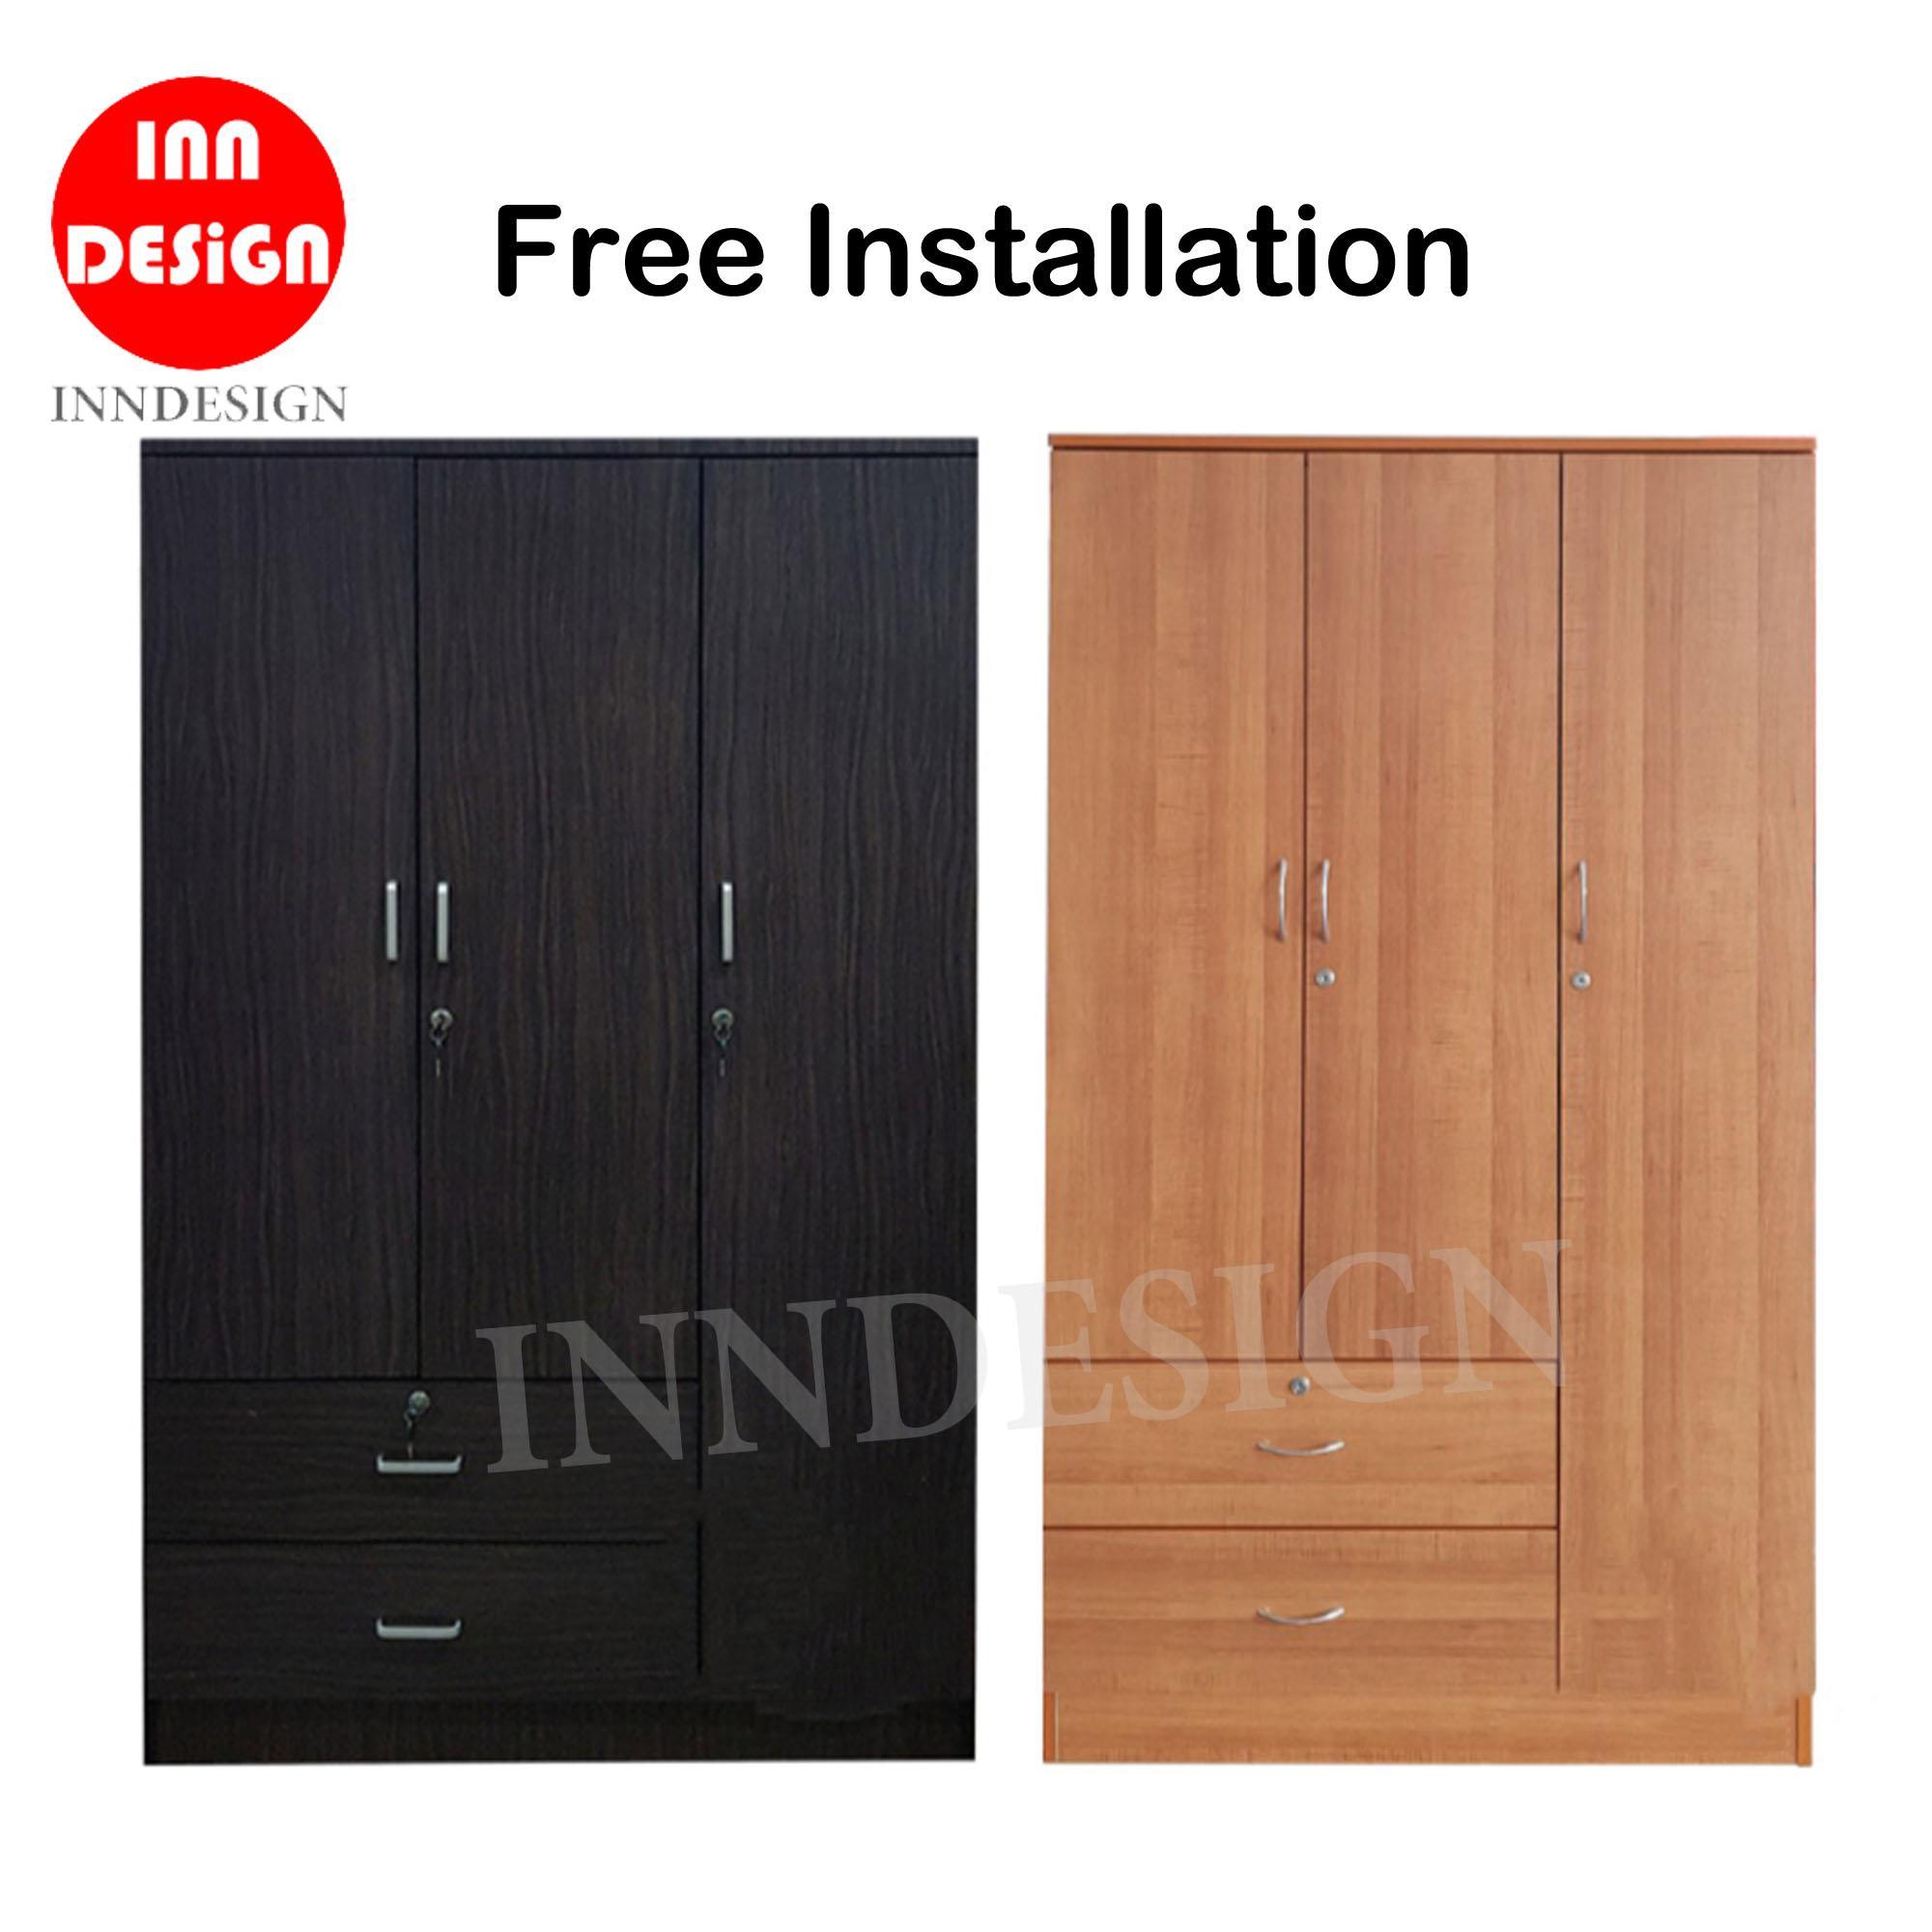 [NEXT DAY DELIVERY] Jordan III 3 Doors Wardrobe (Free Installation) / Standalone Wardrobe / Open Door Wardrobe